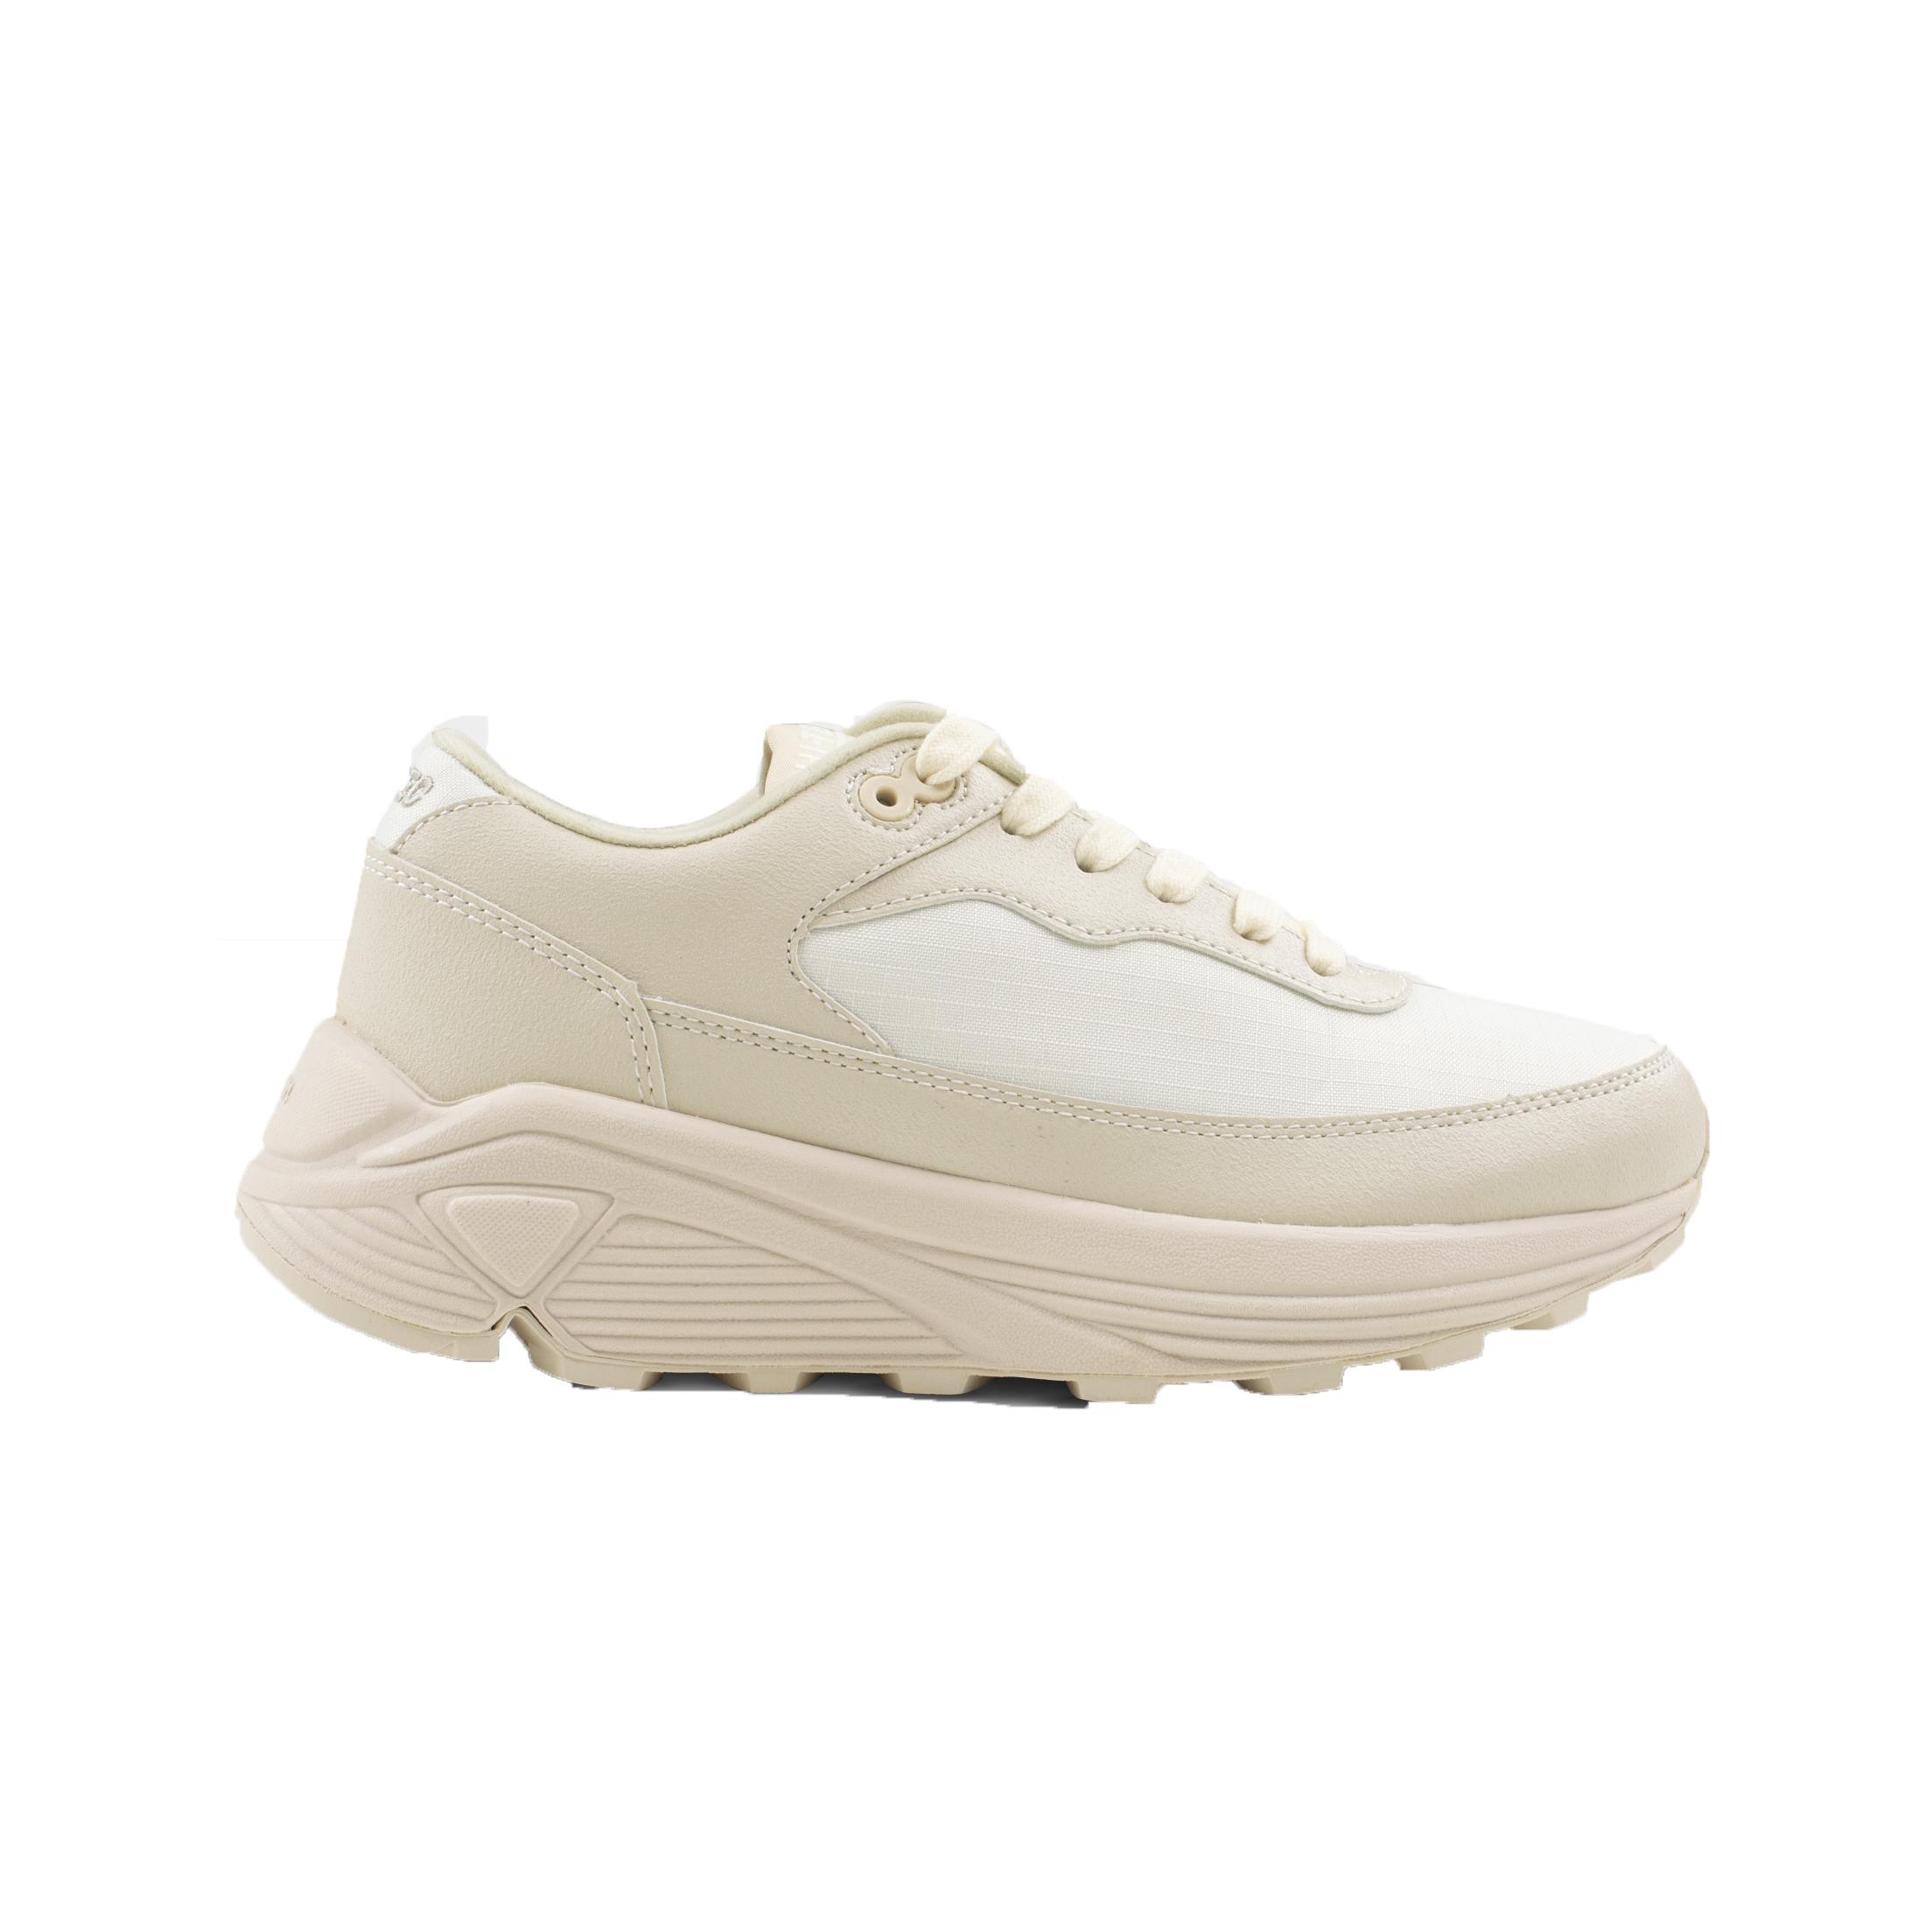 Image of   HI-TEC Hi-Tec Sneakers Walk Lite Beige/off White